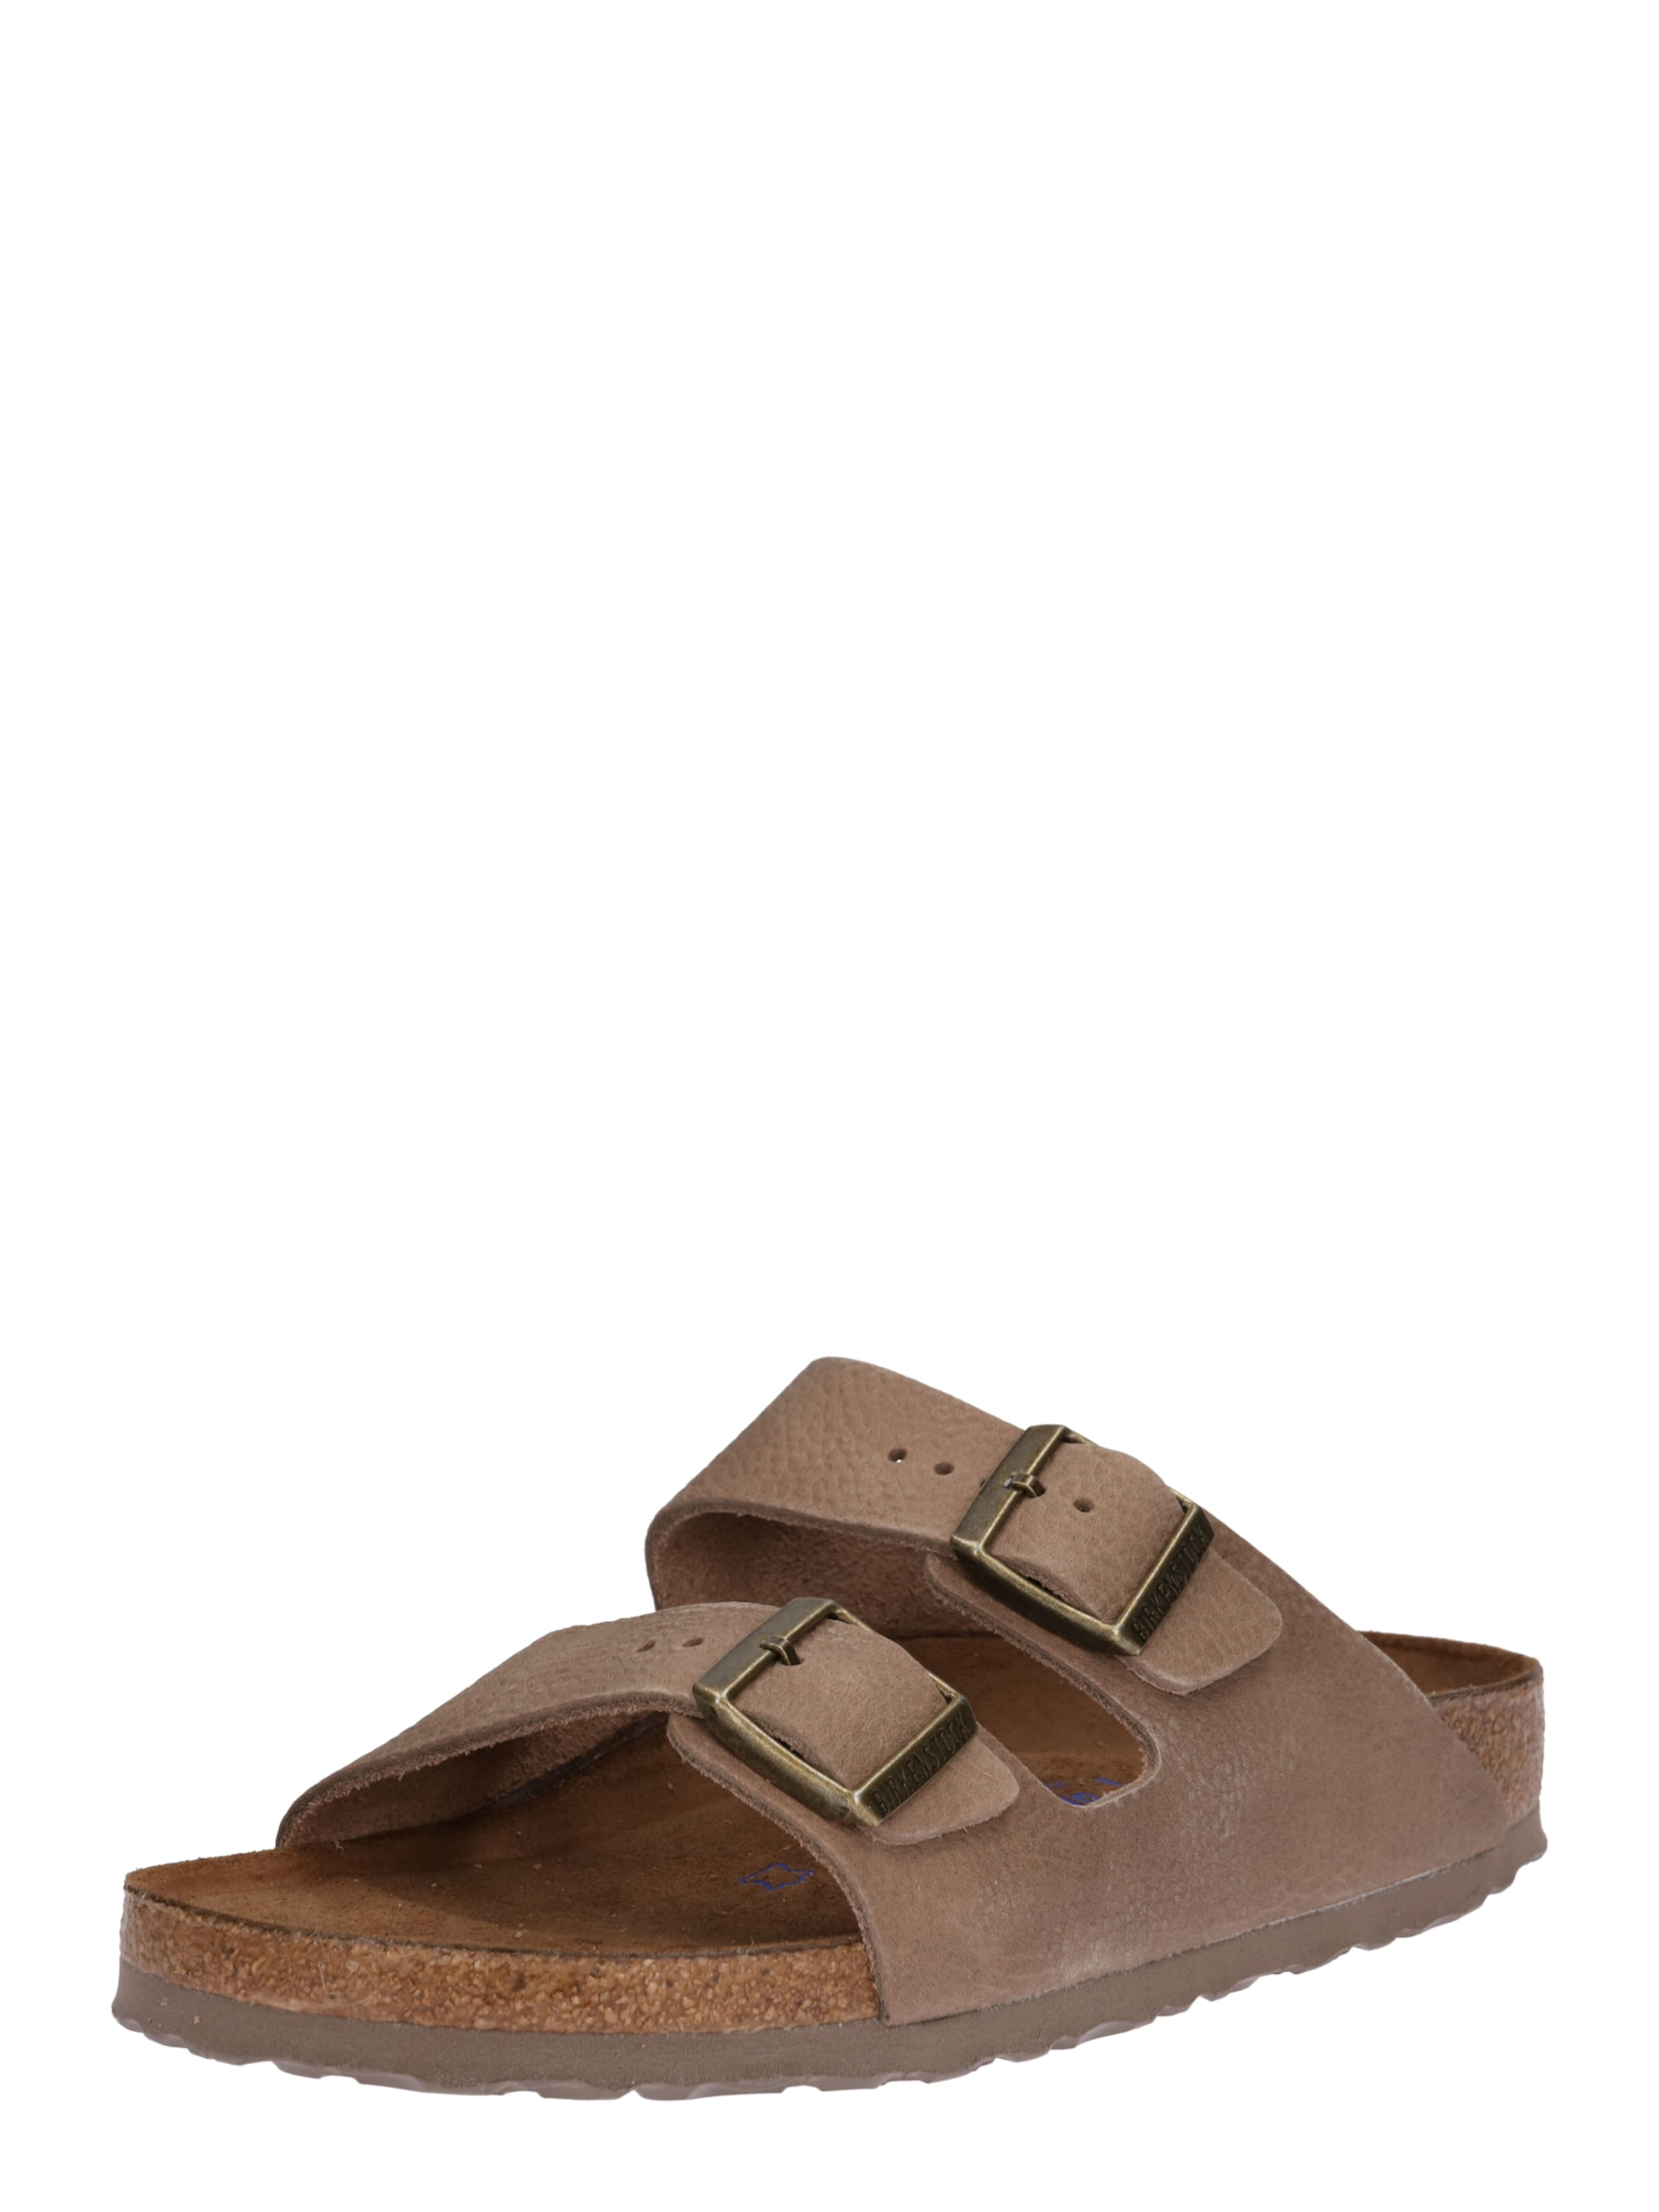 BIRKENSTOCK Pantolette Arizona Verschleißfeste billige Schuhe